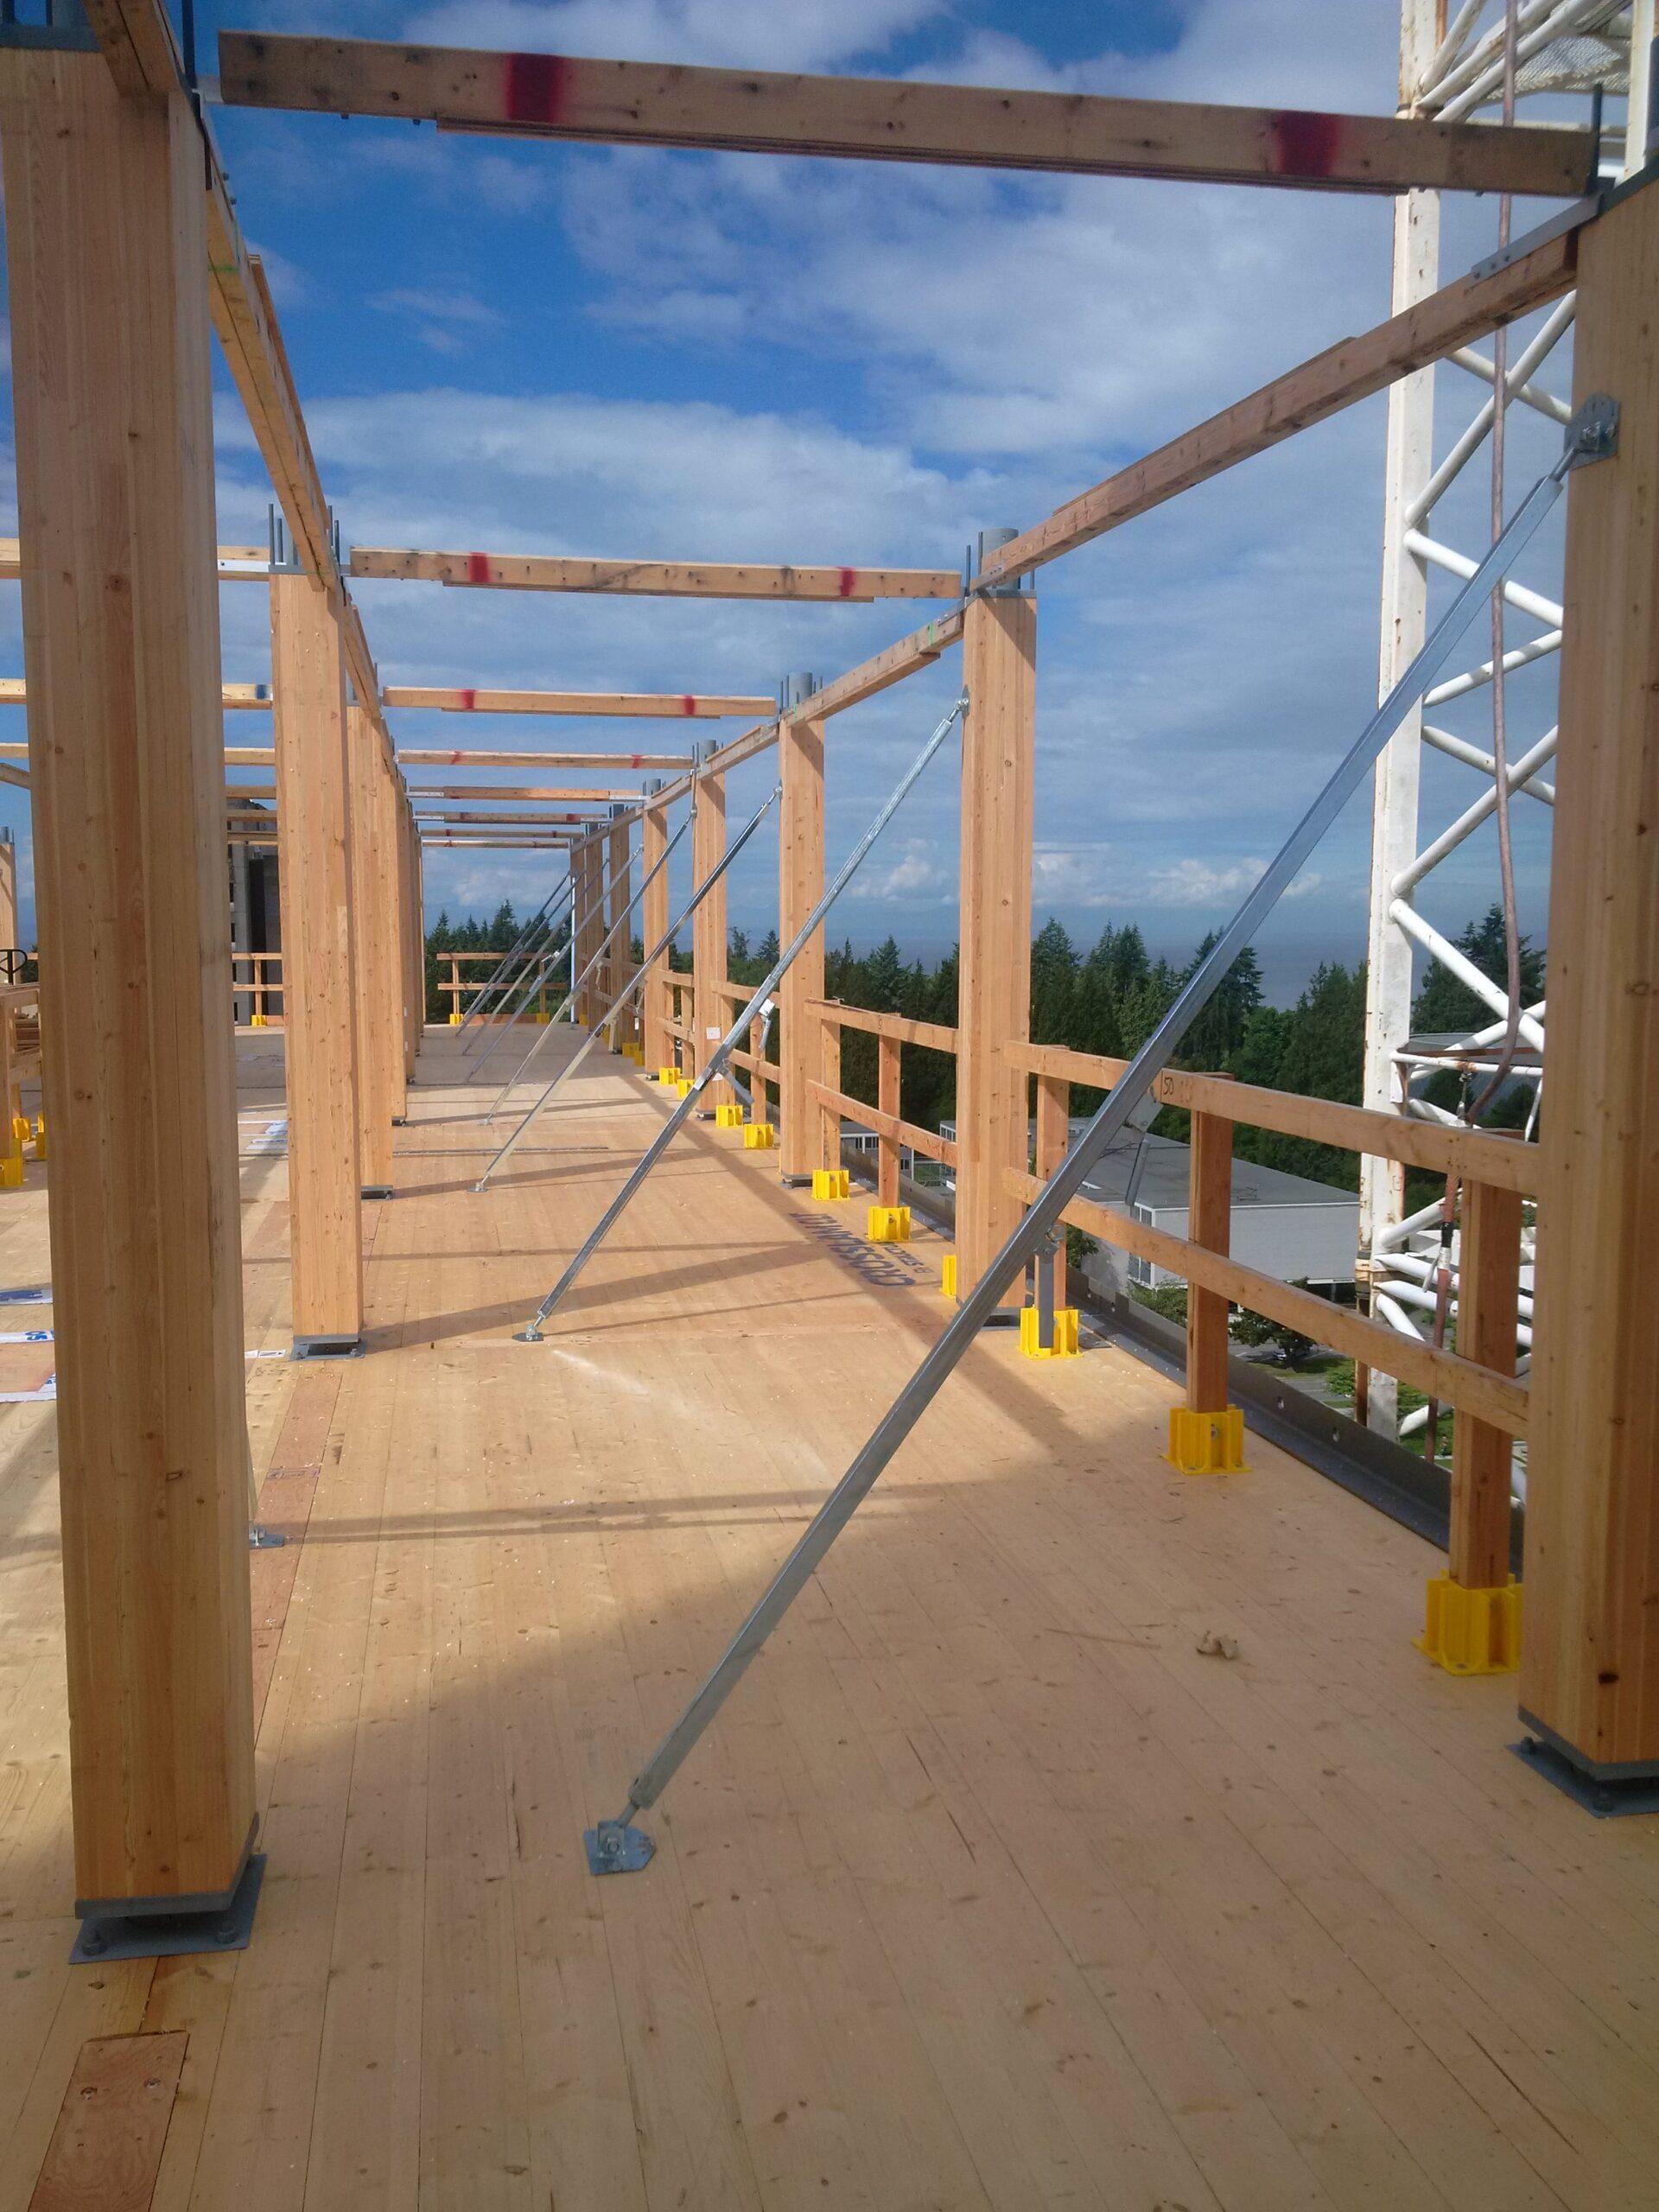 Wood building under construction